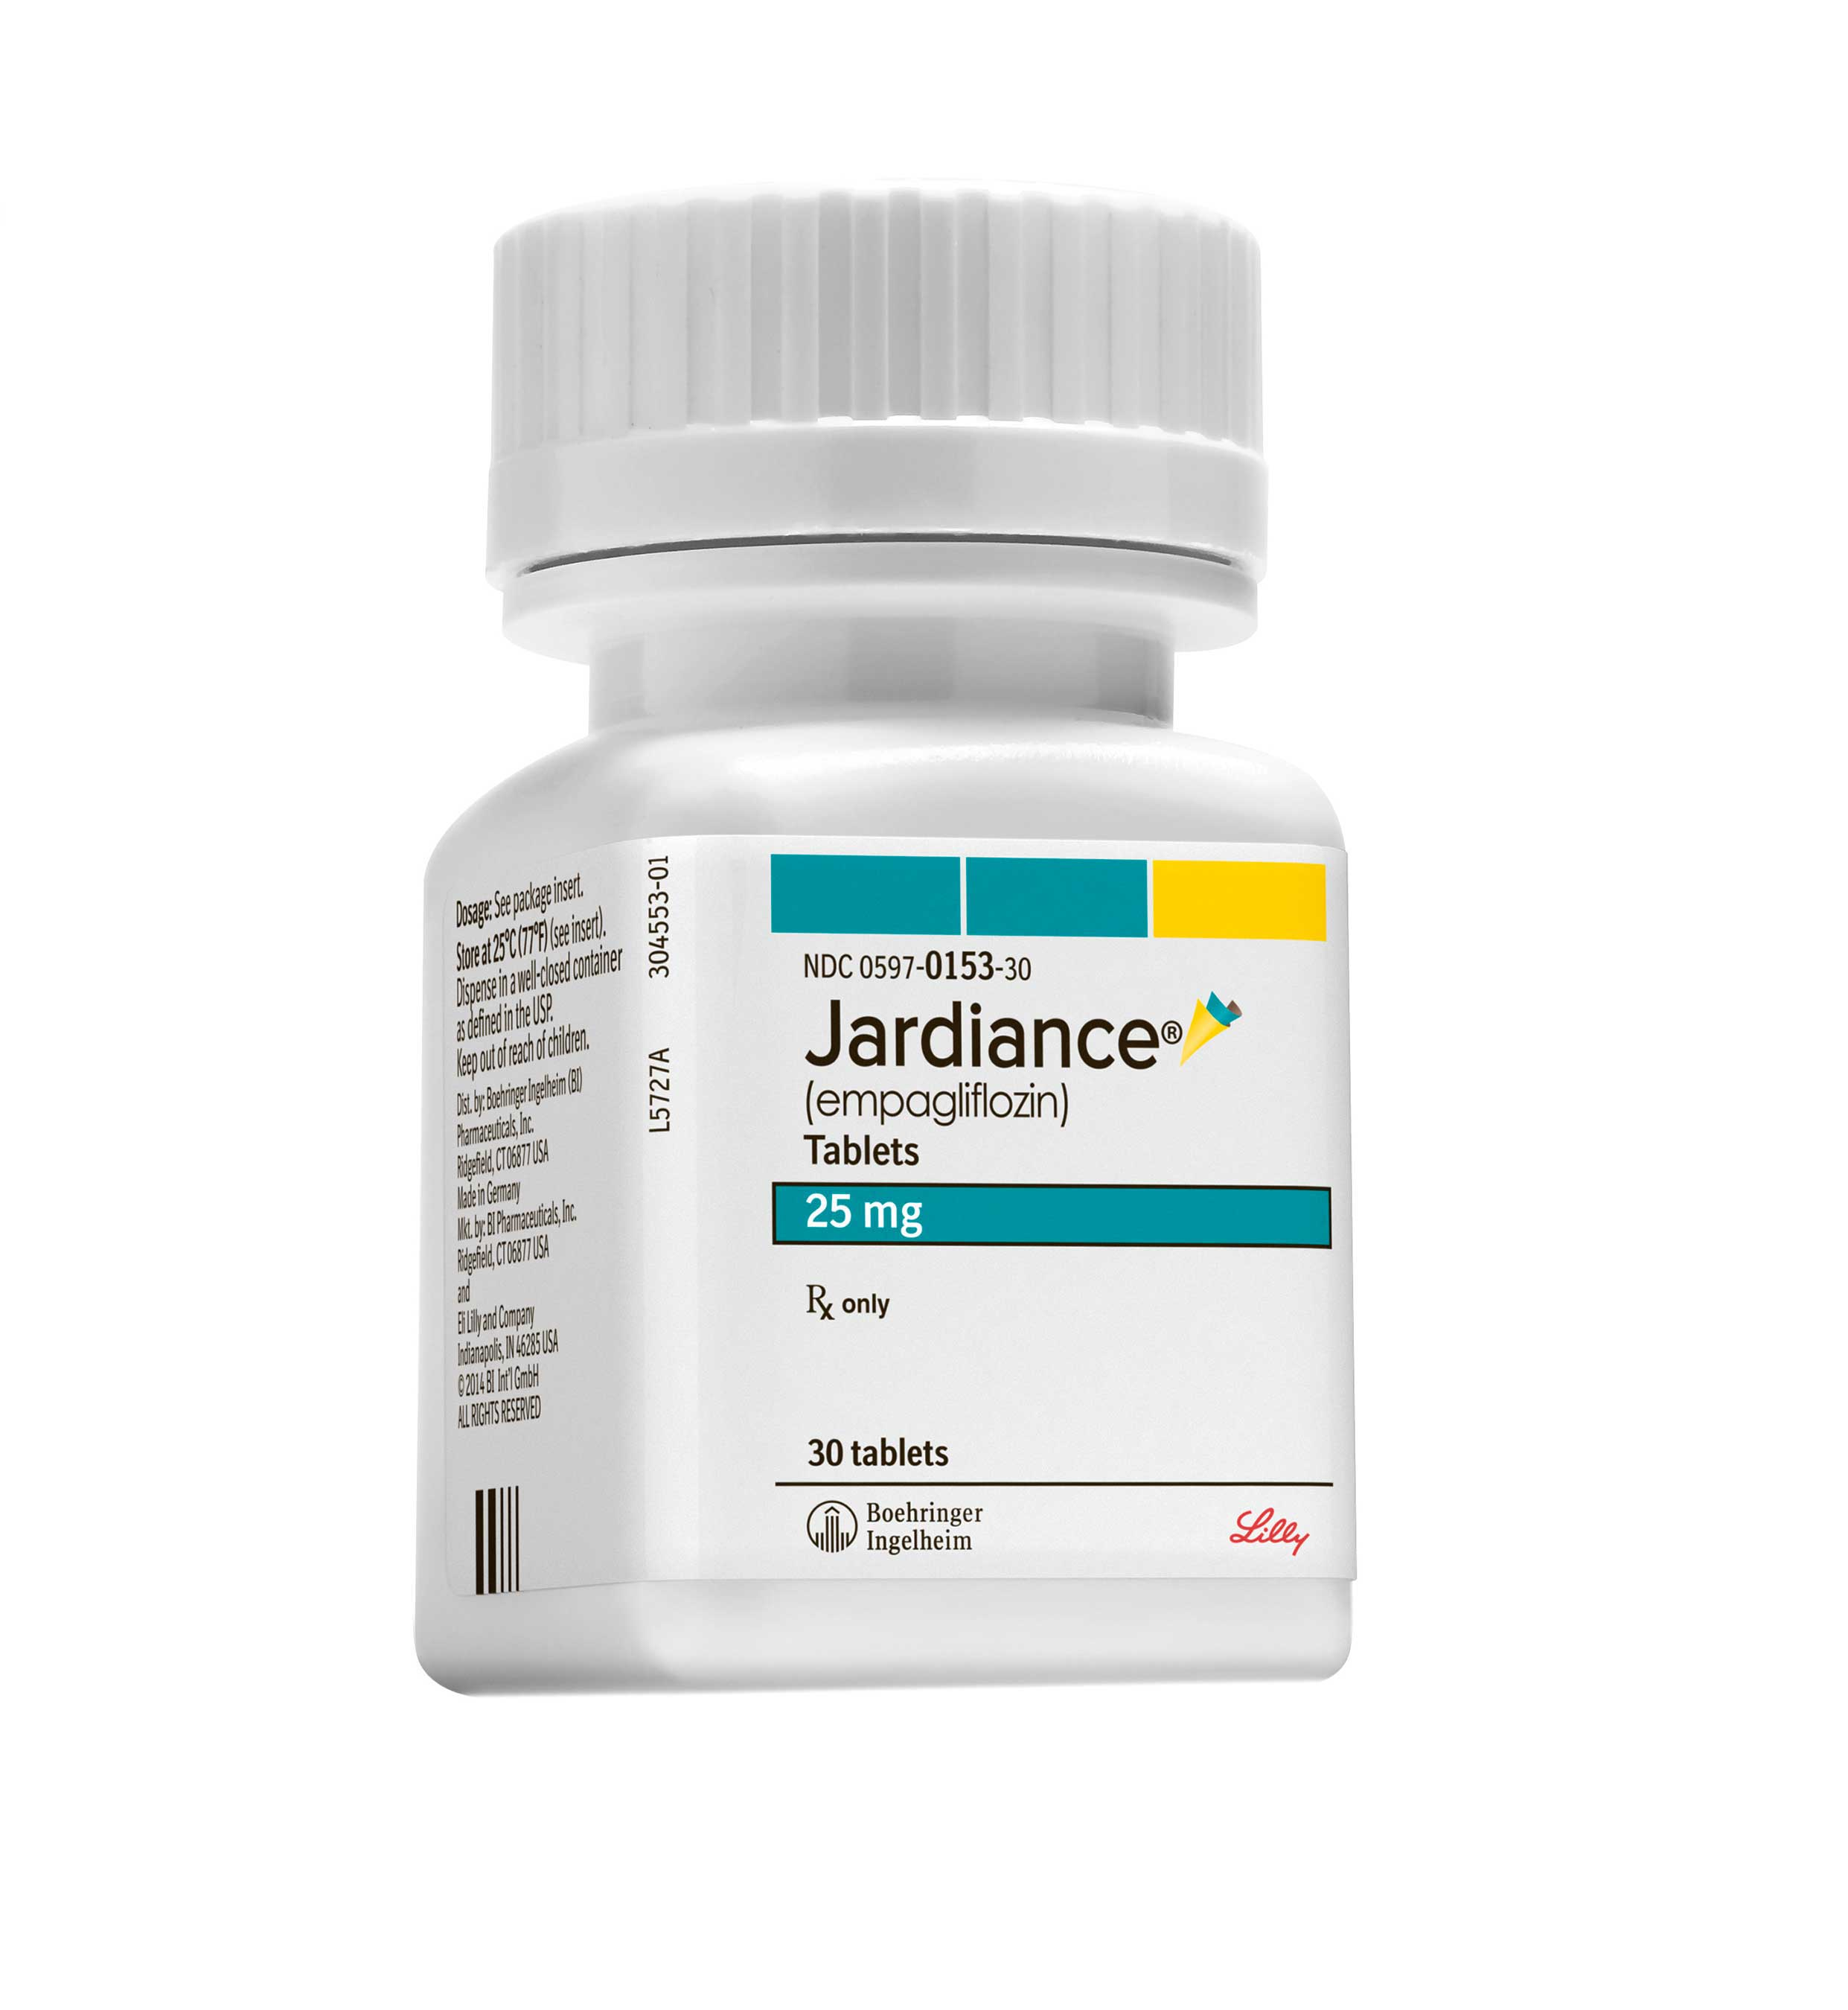 Dapsone medication